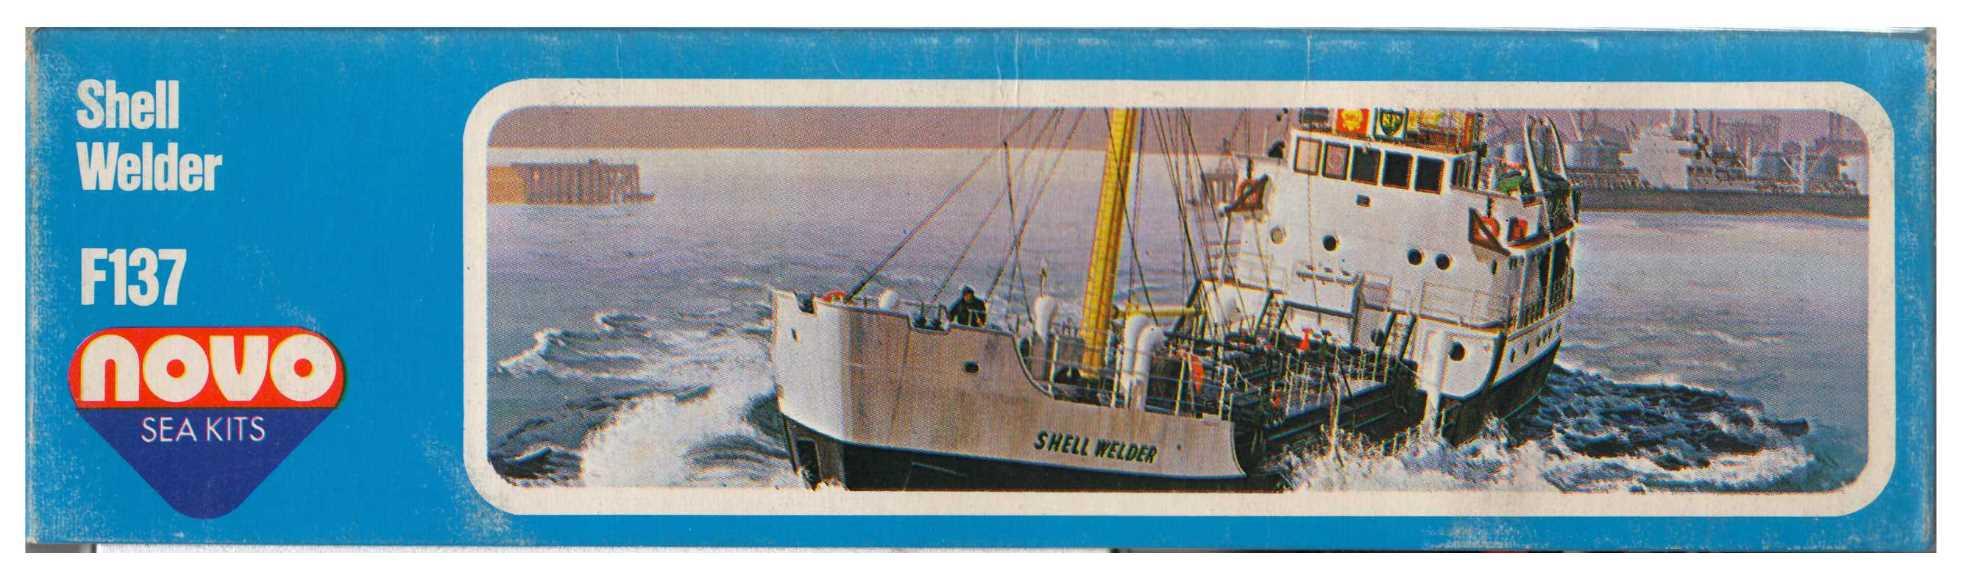 Малая сторона коробки NOVO F137 Shell Welder - coastal tanker